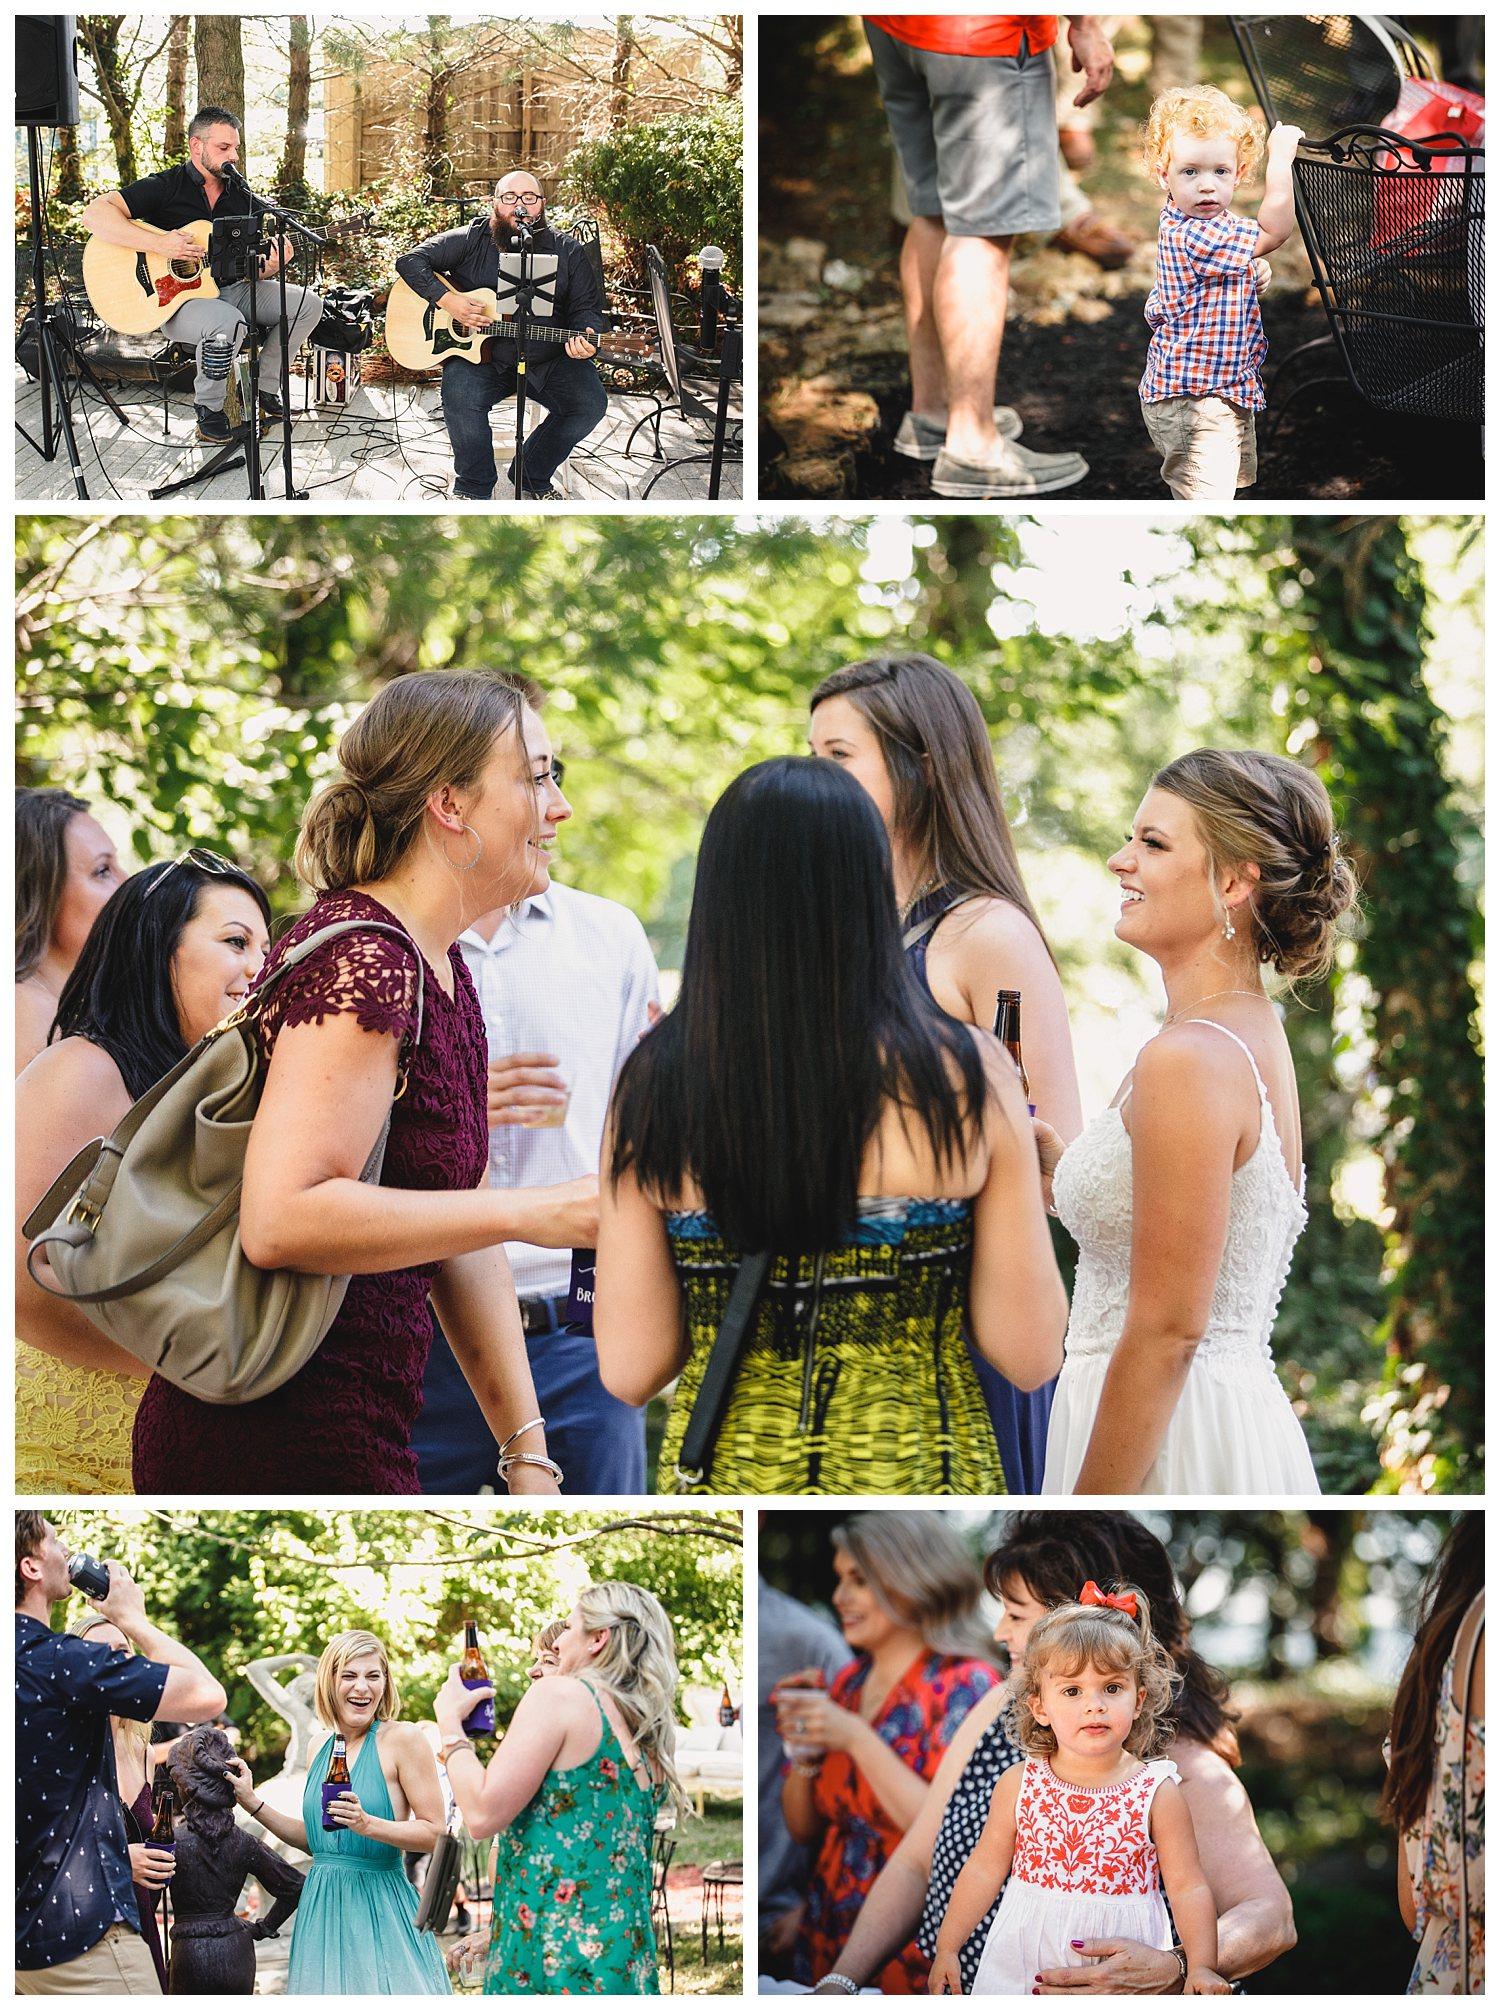 Kelsey_Diane_Photography_Kansas_City_Engagement_Wedding_Photographer_Midwest_Traveling_Missouri_Lee_Andrew_Hall_And_Garden_Blue_Springs_Wedding_Clayton_Kimberly_Summer_Wedding_0839.jpg